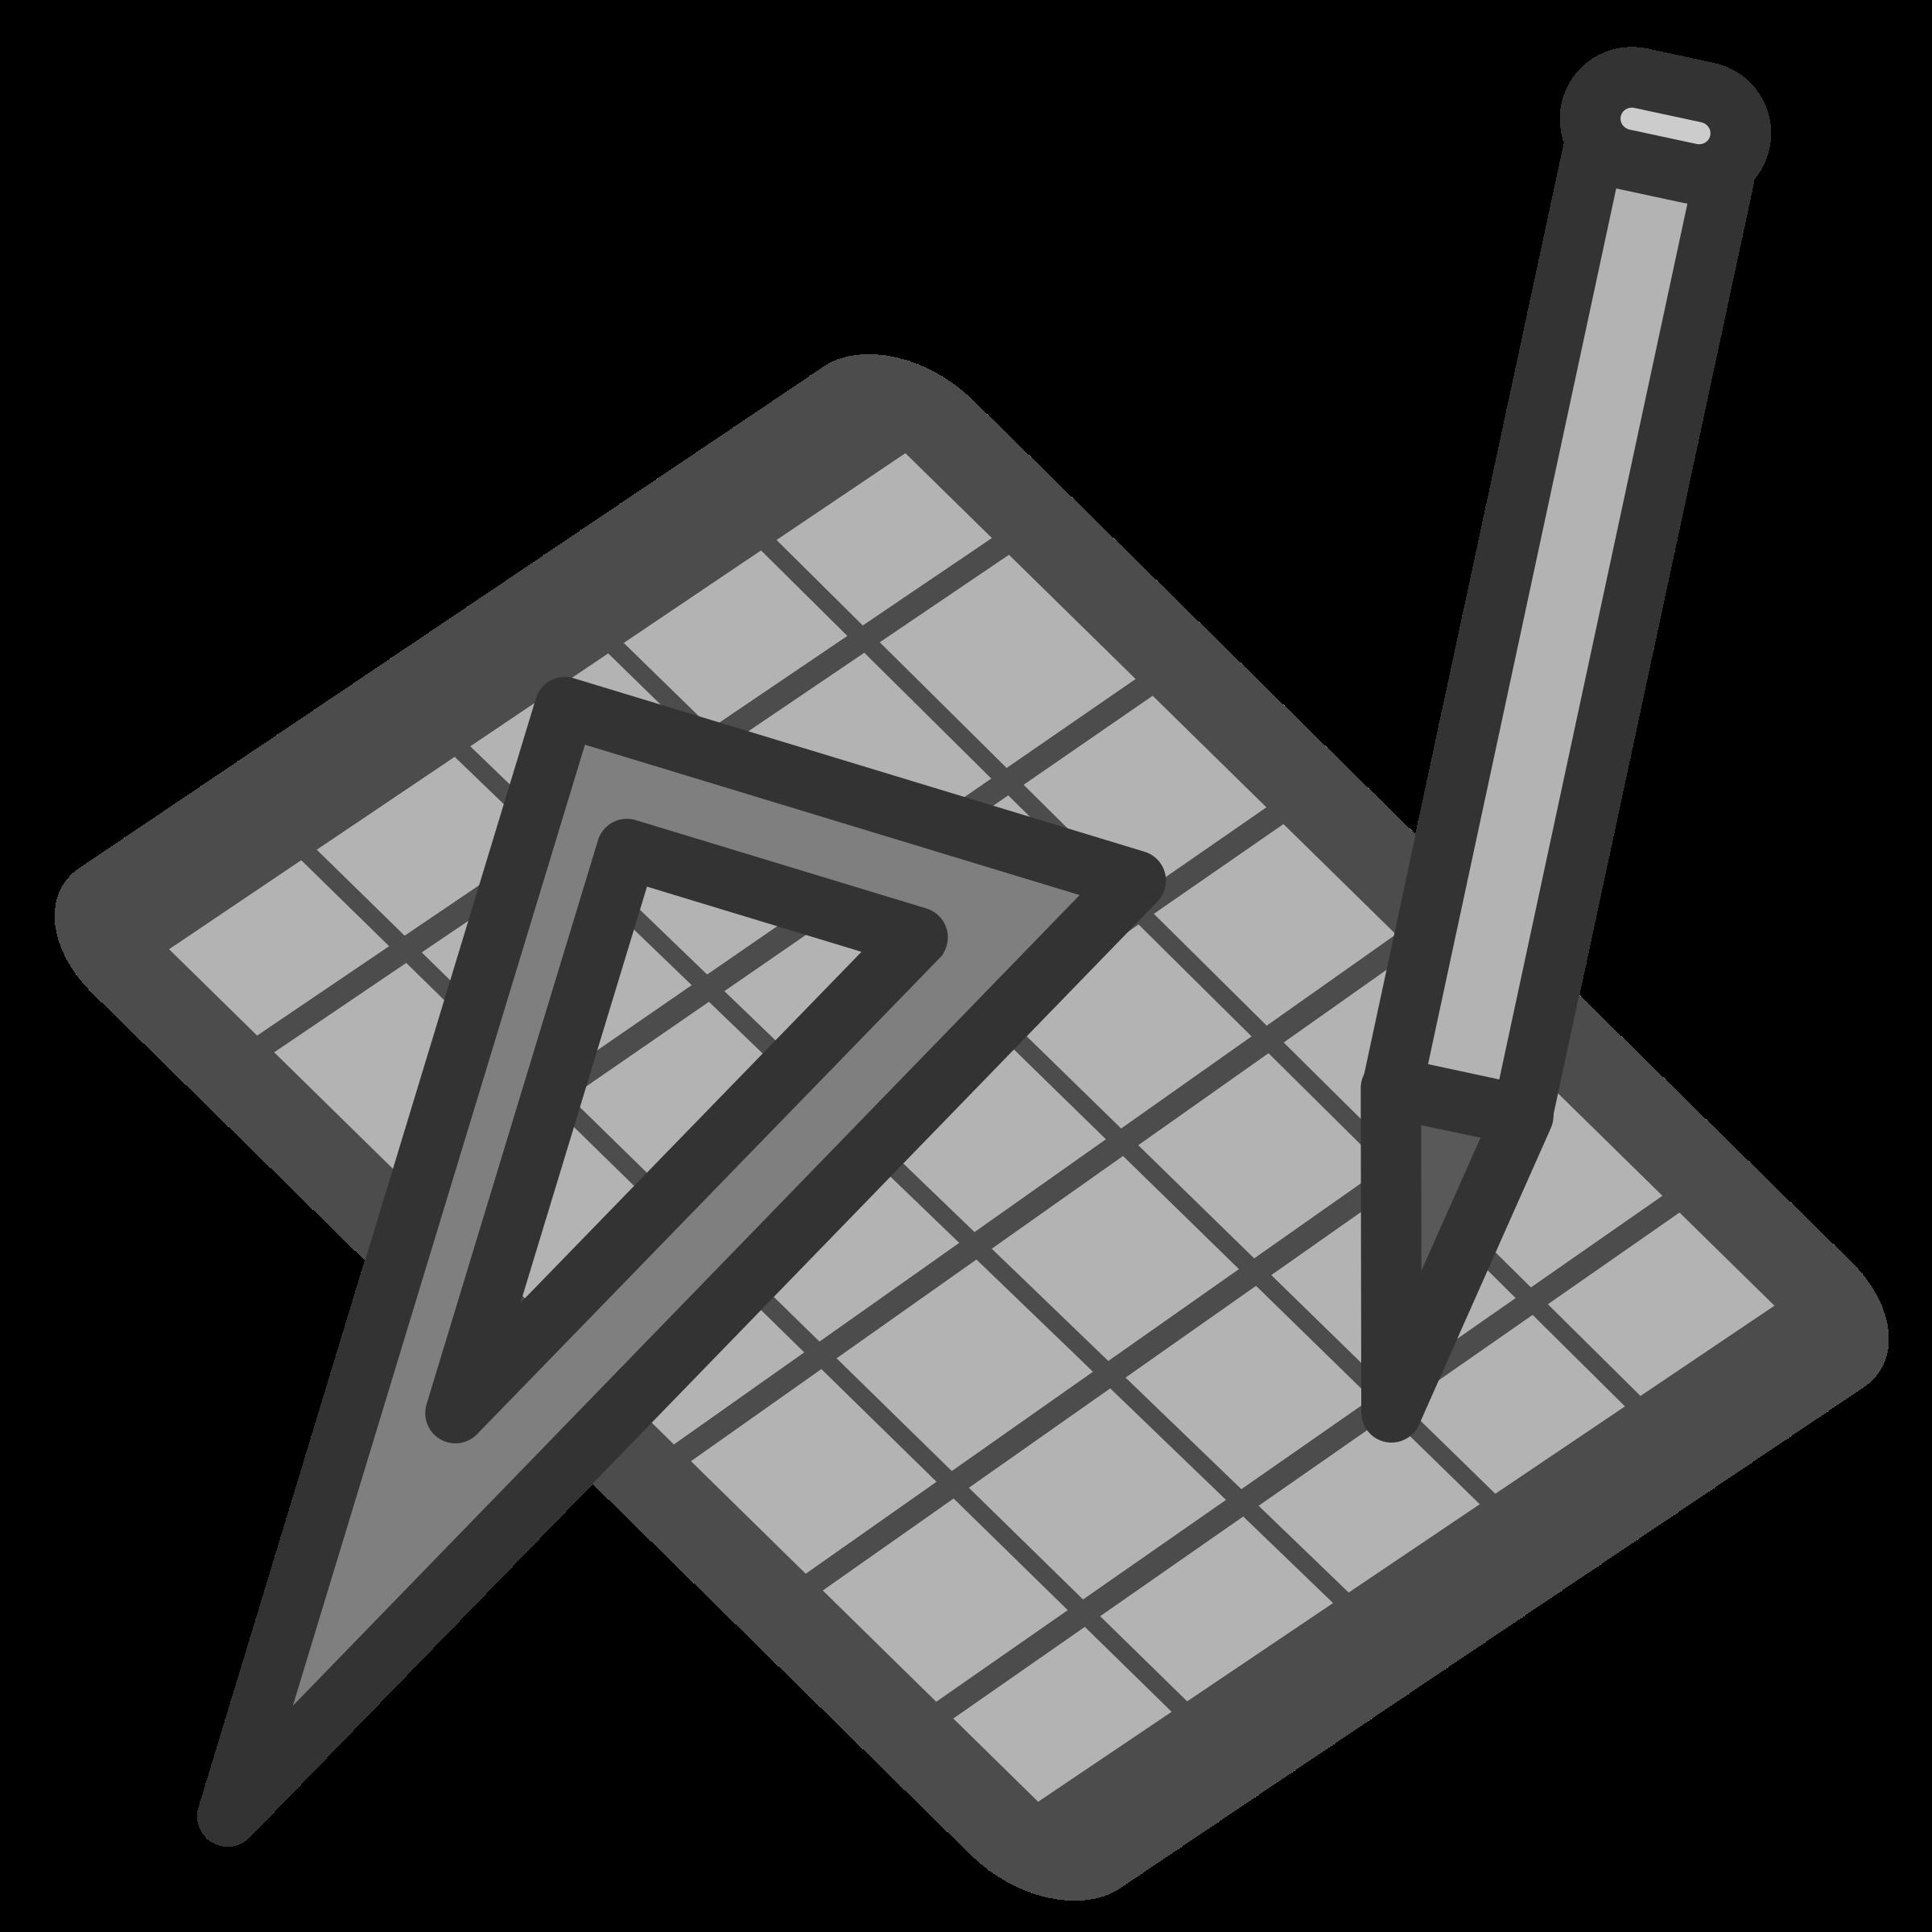 Geometric Clipart-Geometric Clipart-18